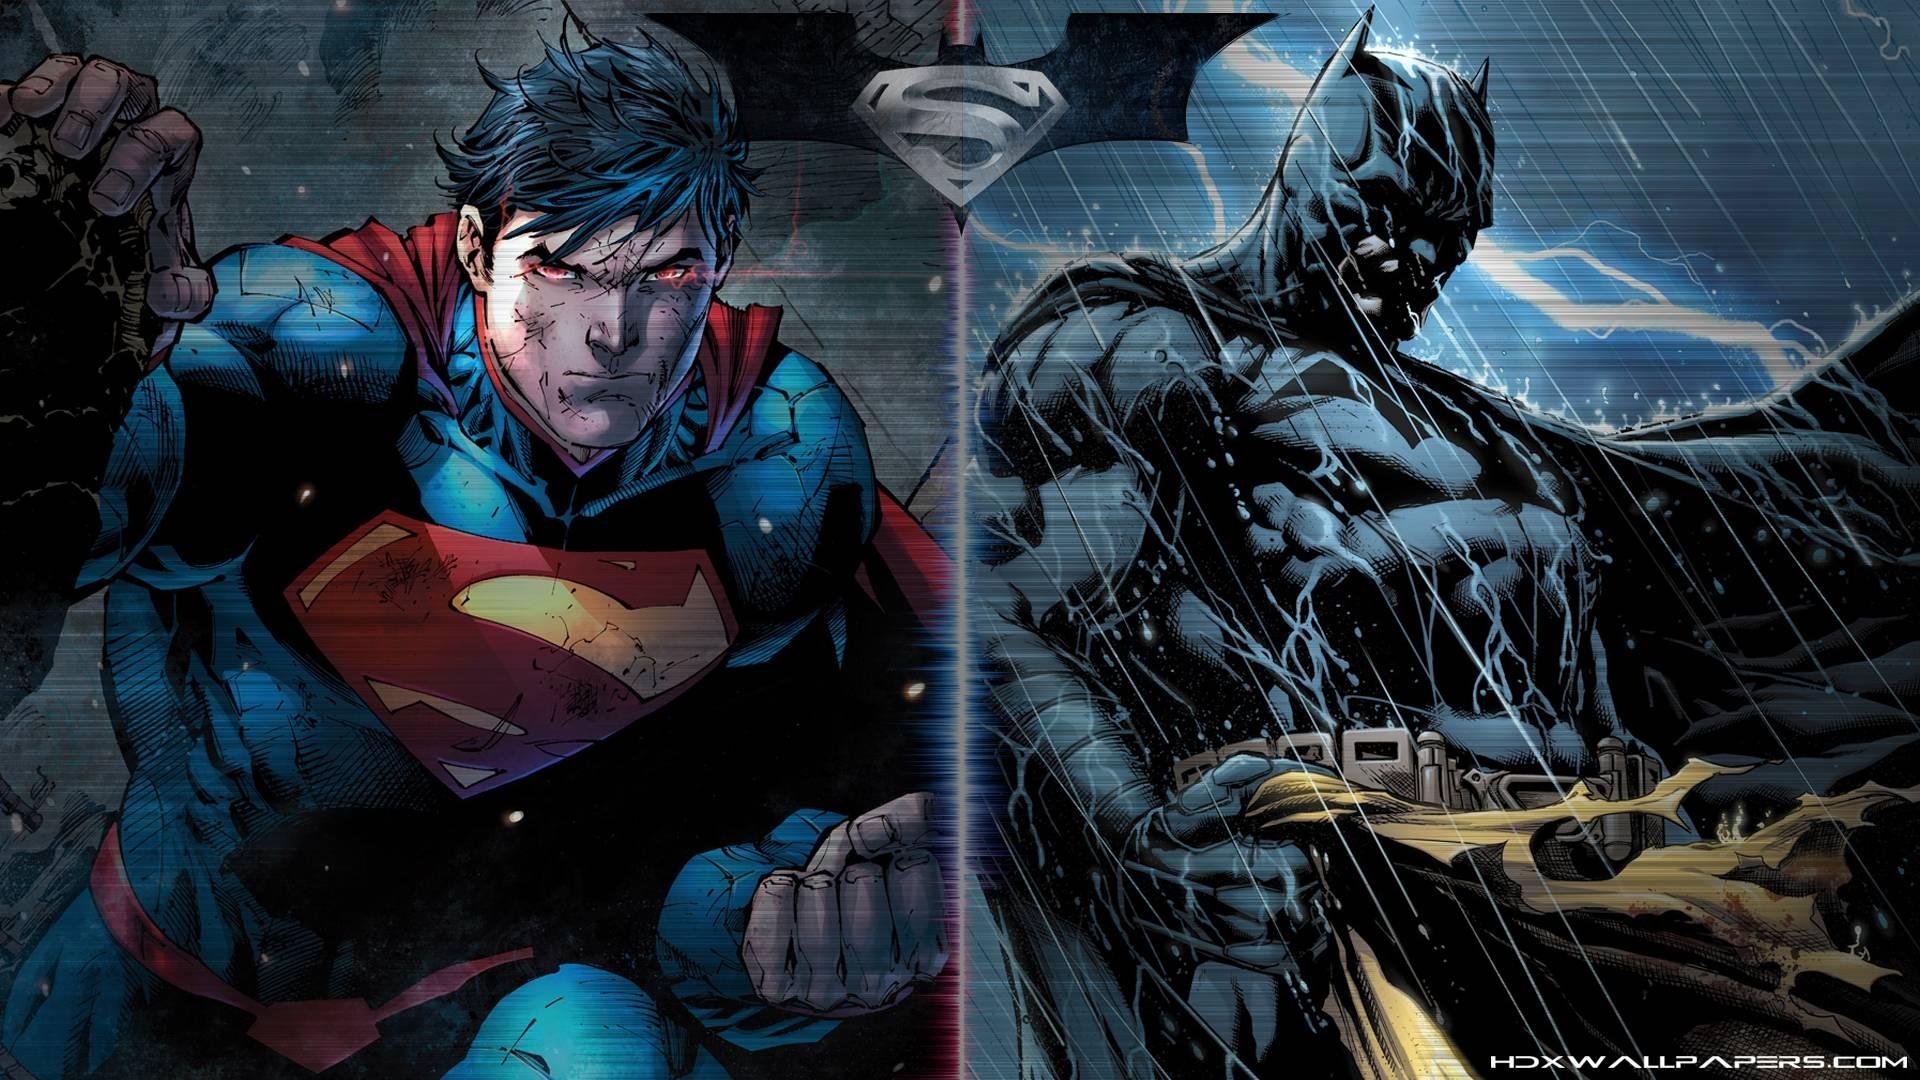 rts2000 images batman/superman hd wallpaper and background photos